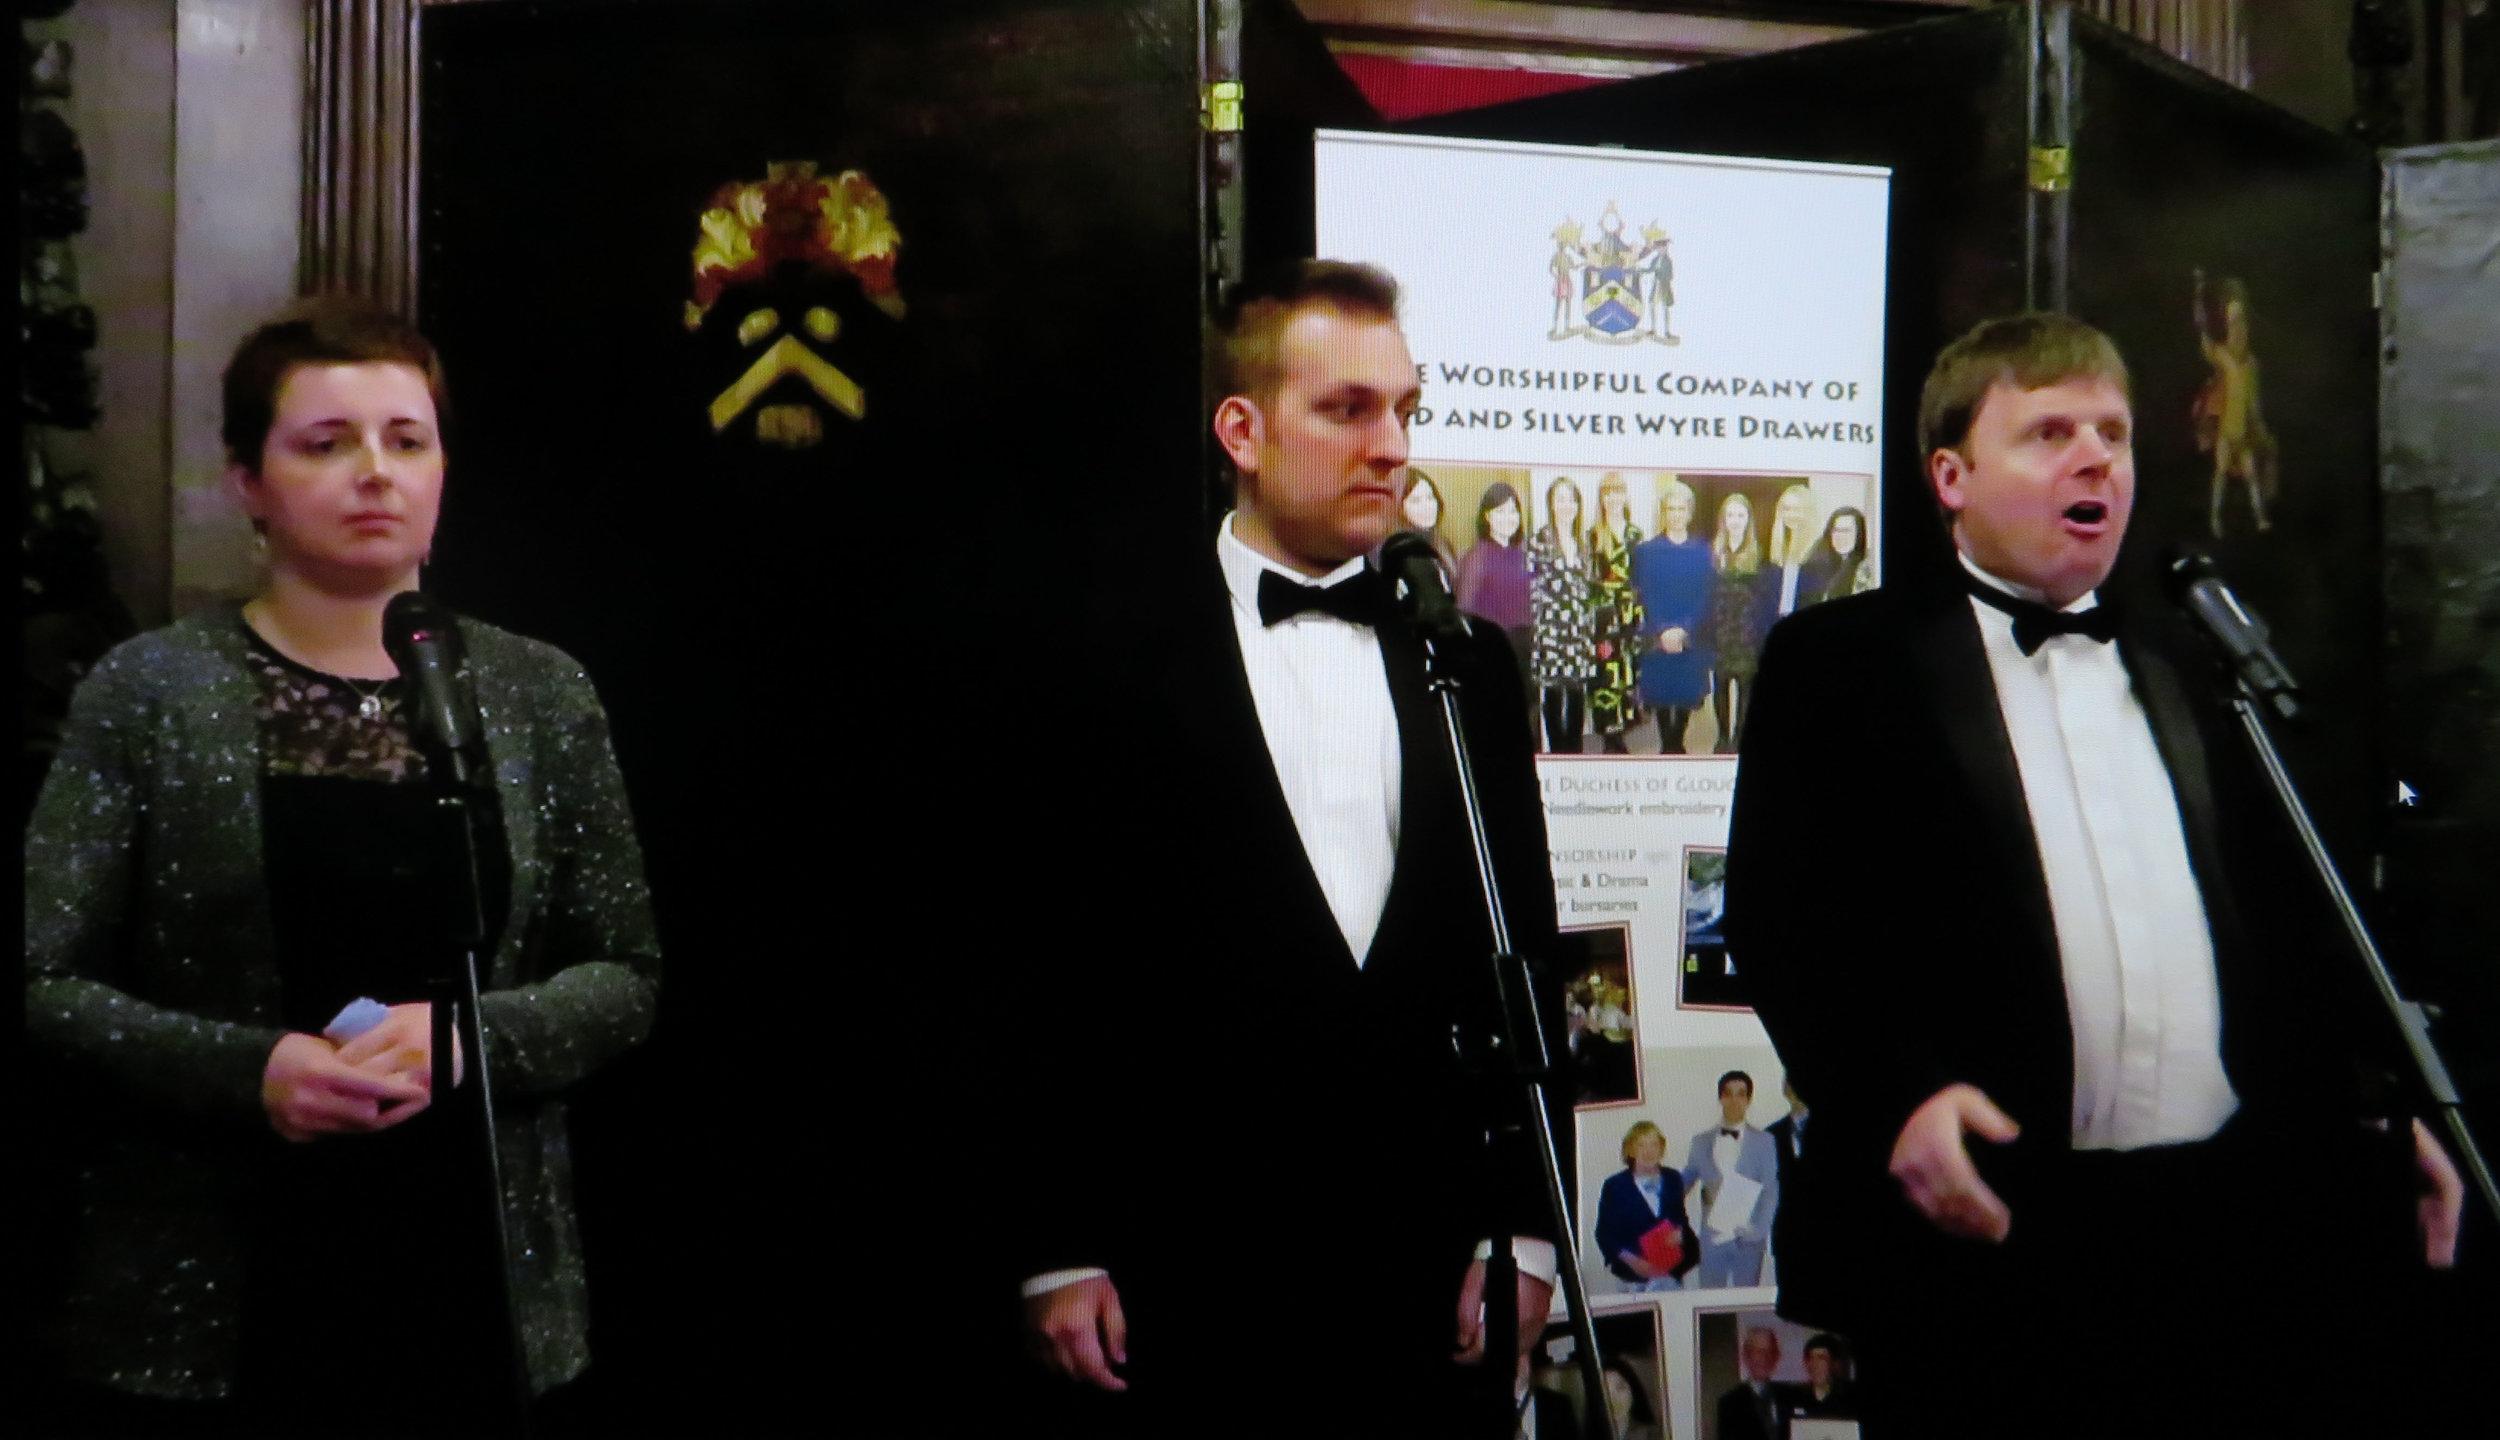 Orpheus Students - Charlotte Rowling, Thomas Puttock & Angus Morton